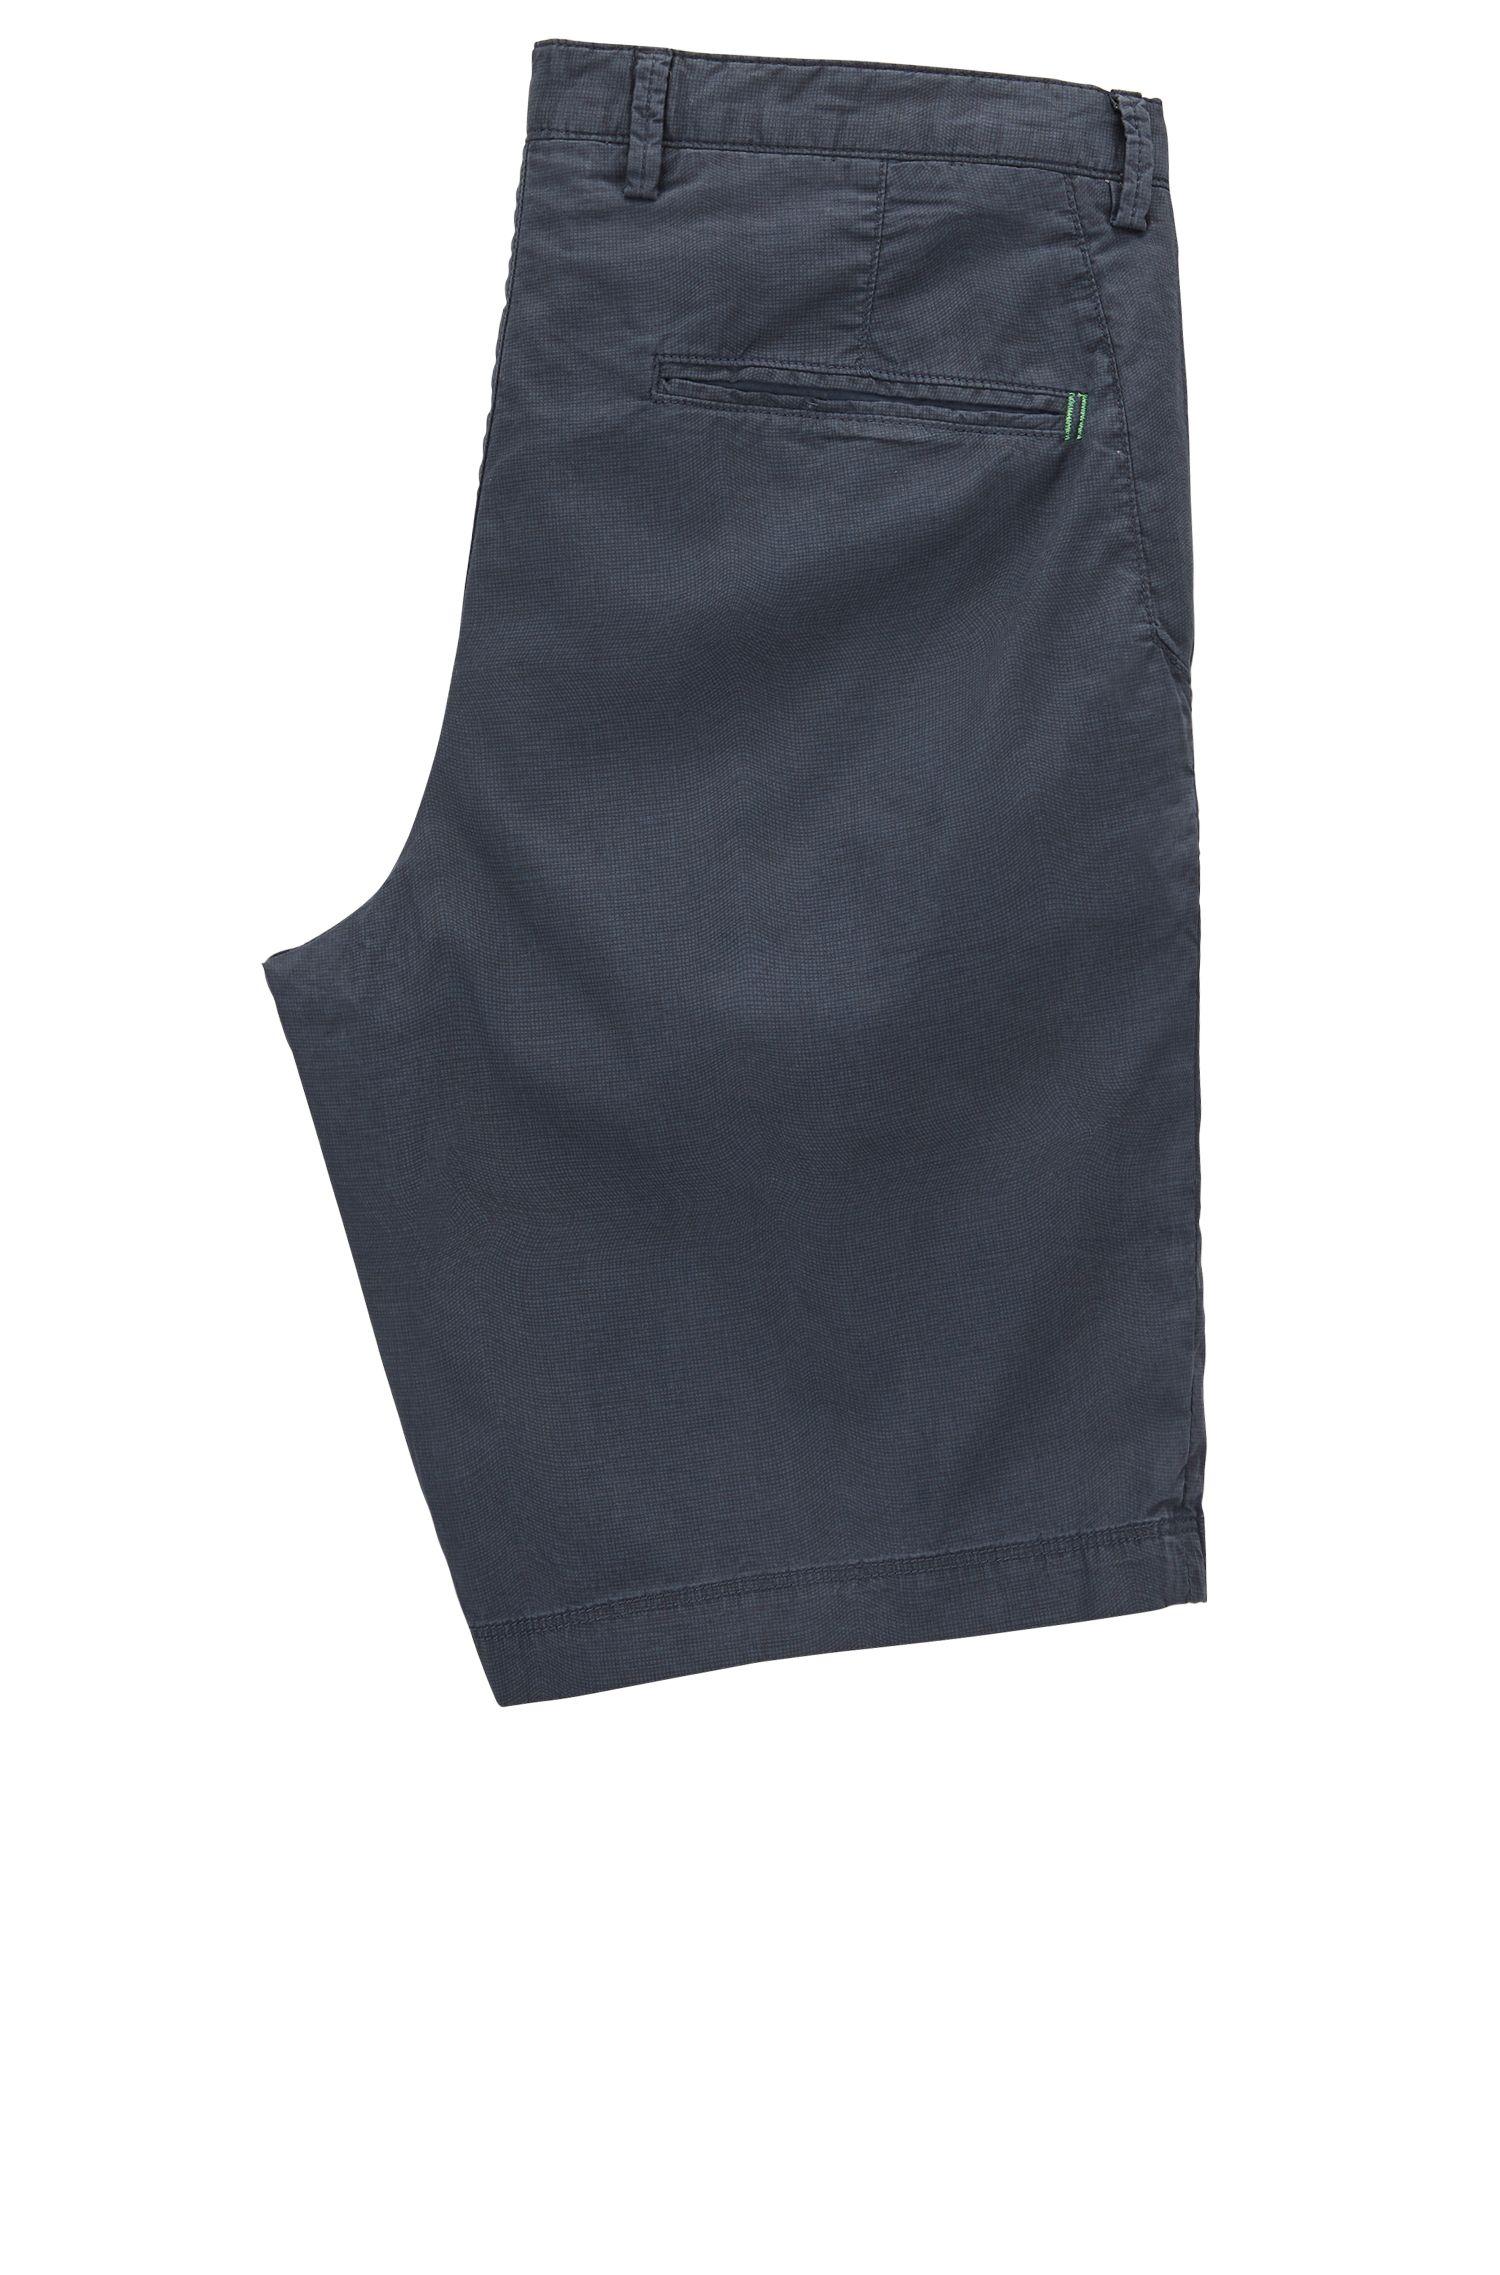 Shorts aus Stretch-Baumwolle mit filigranem Karomuster